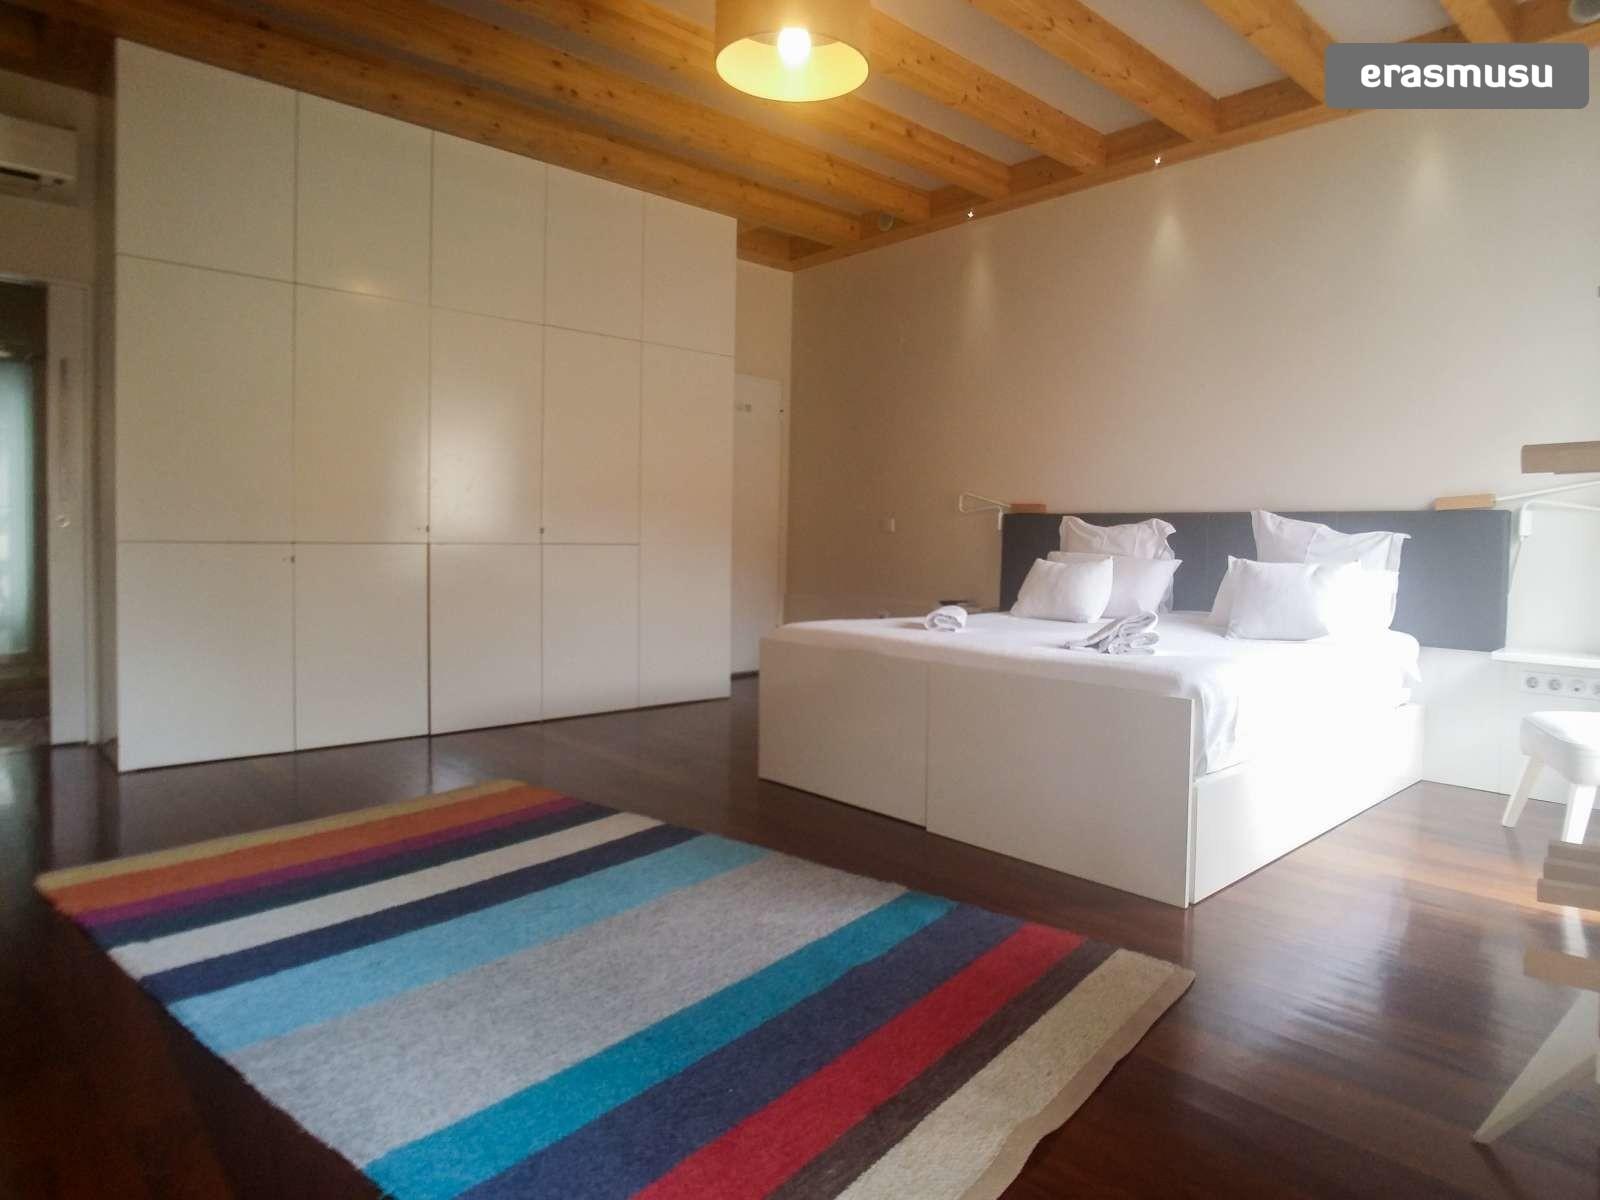 furnished-studio-apartment-rent-sao-nicolau-54218bfbe63b82ee77d1